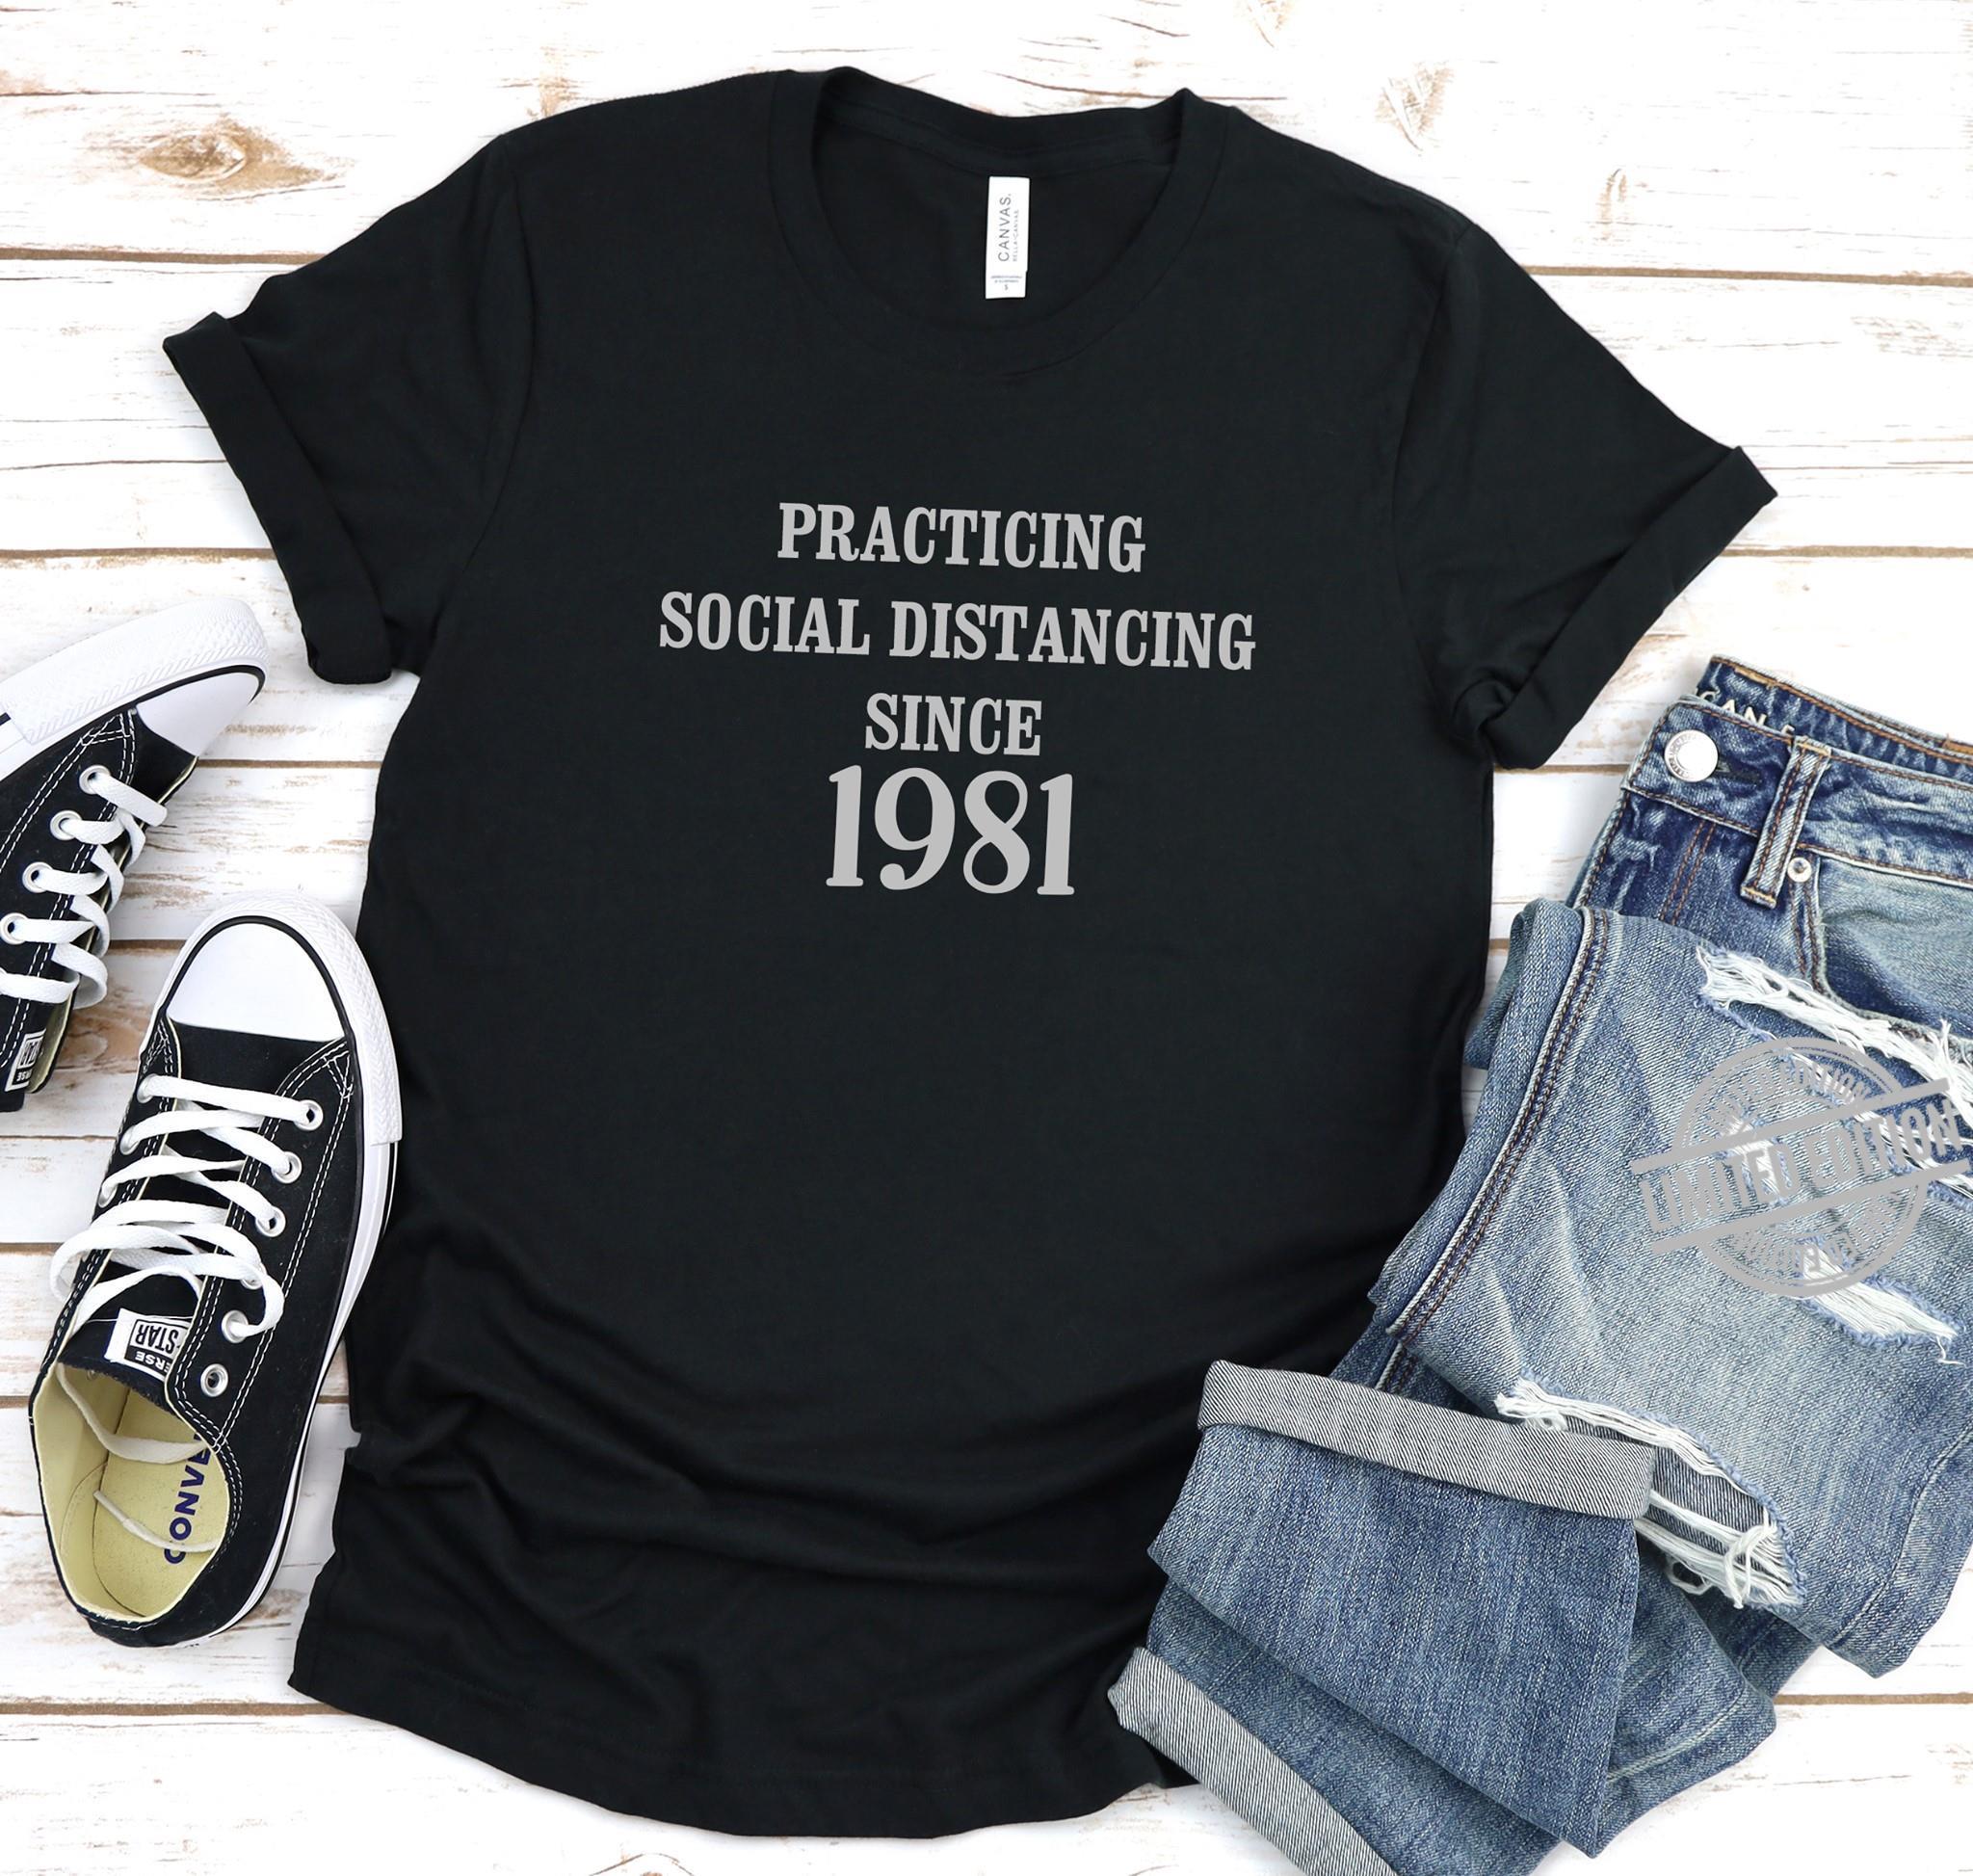 Practicing Social Distancing Since 1981 Shirt